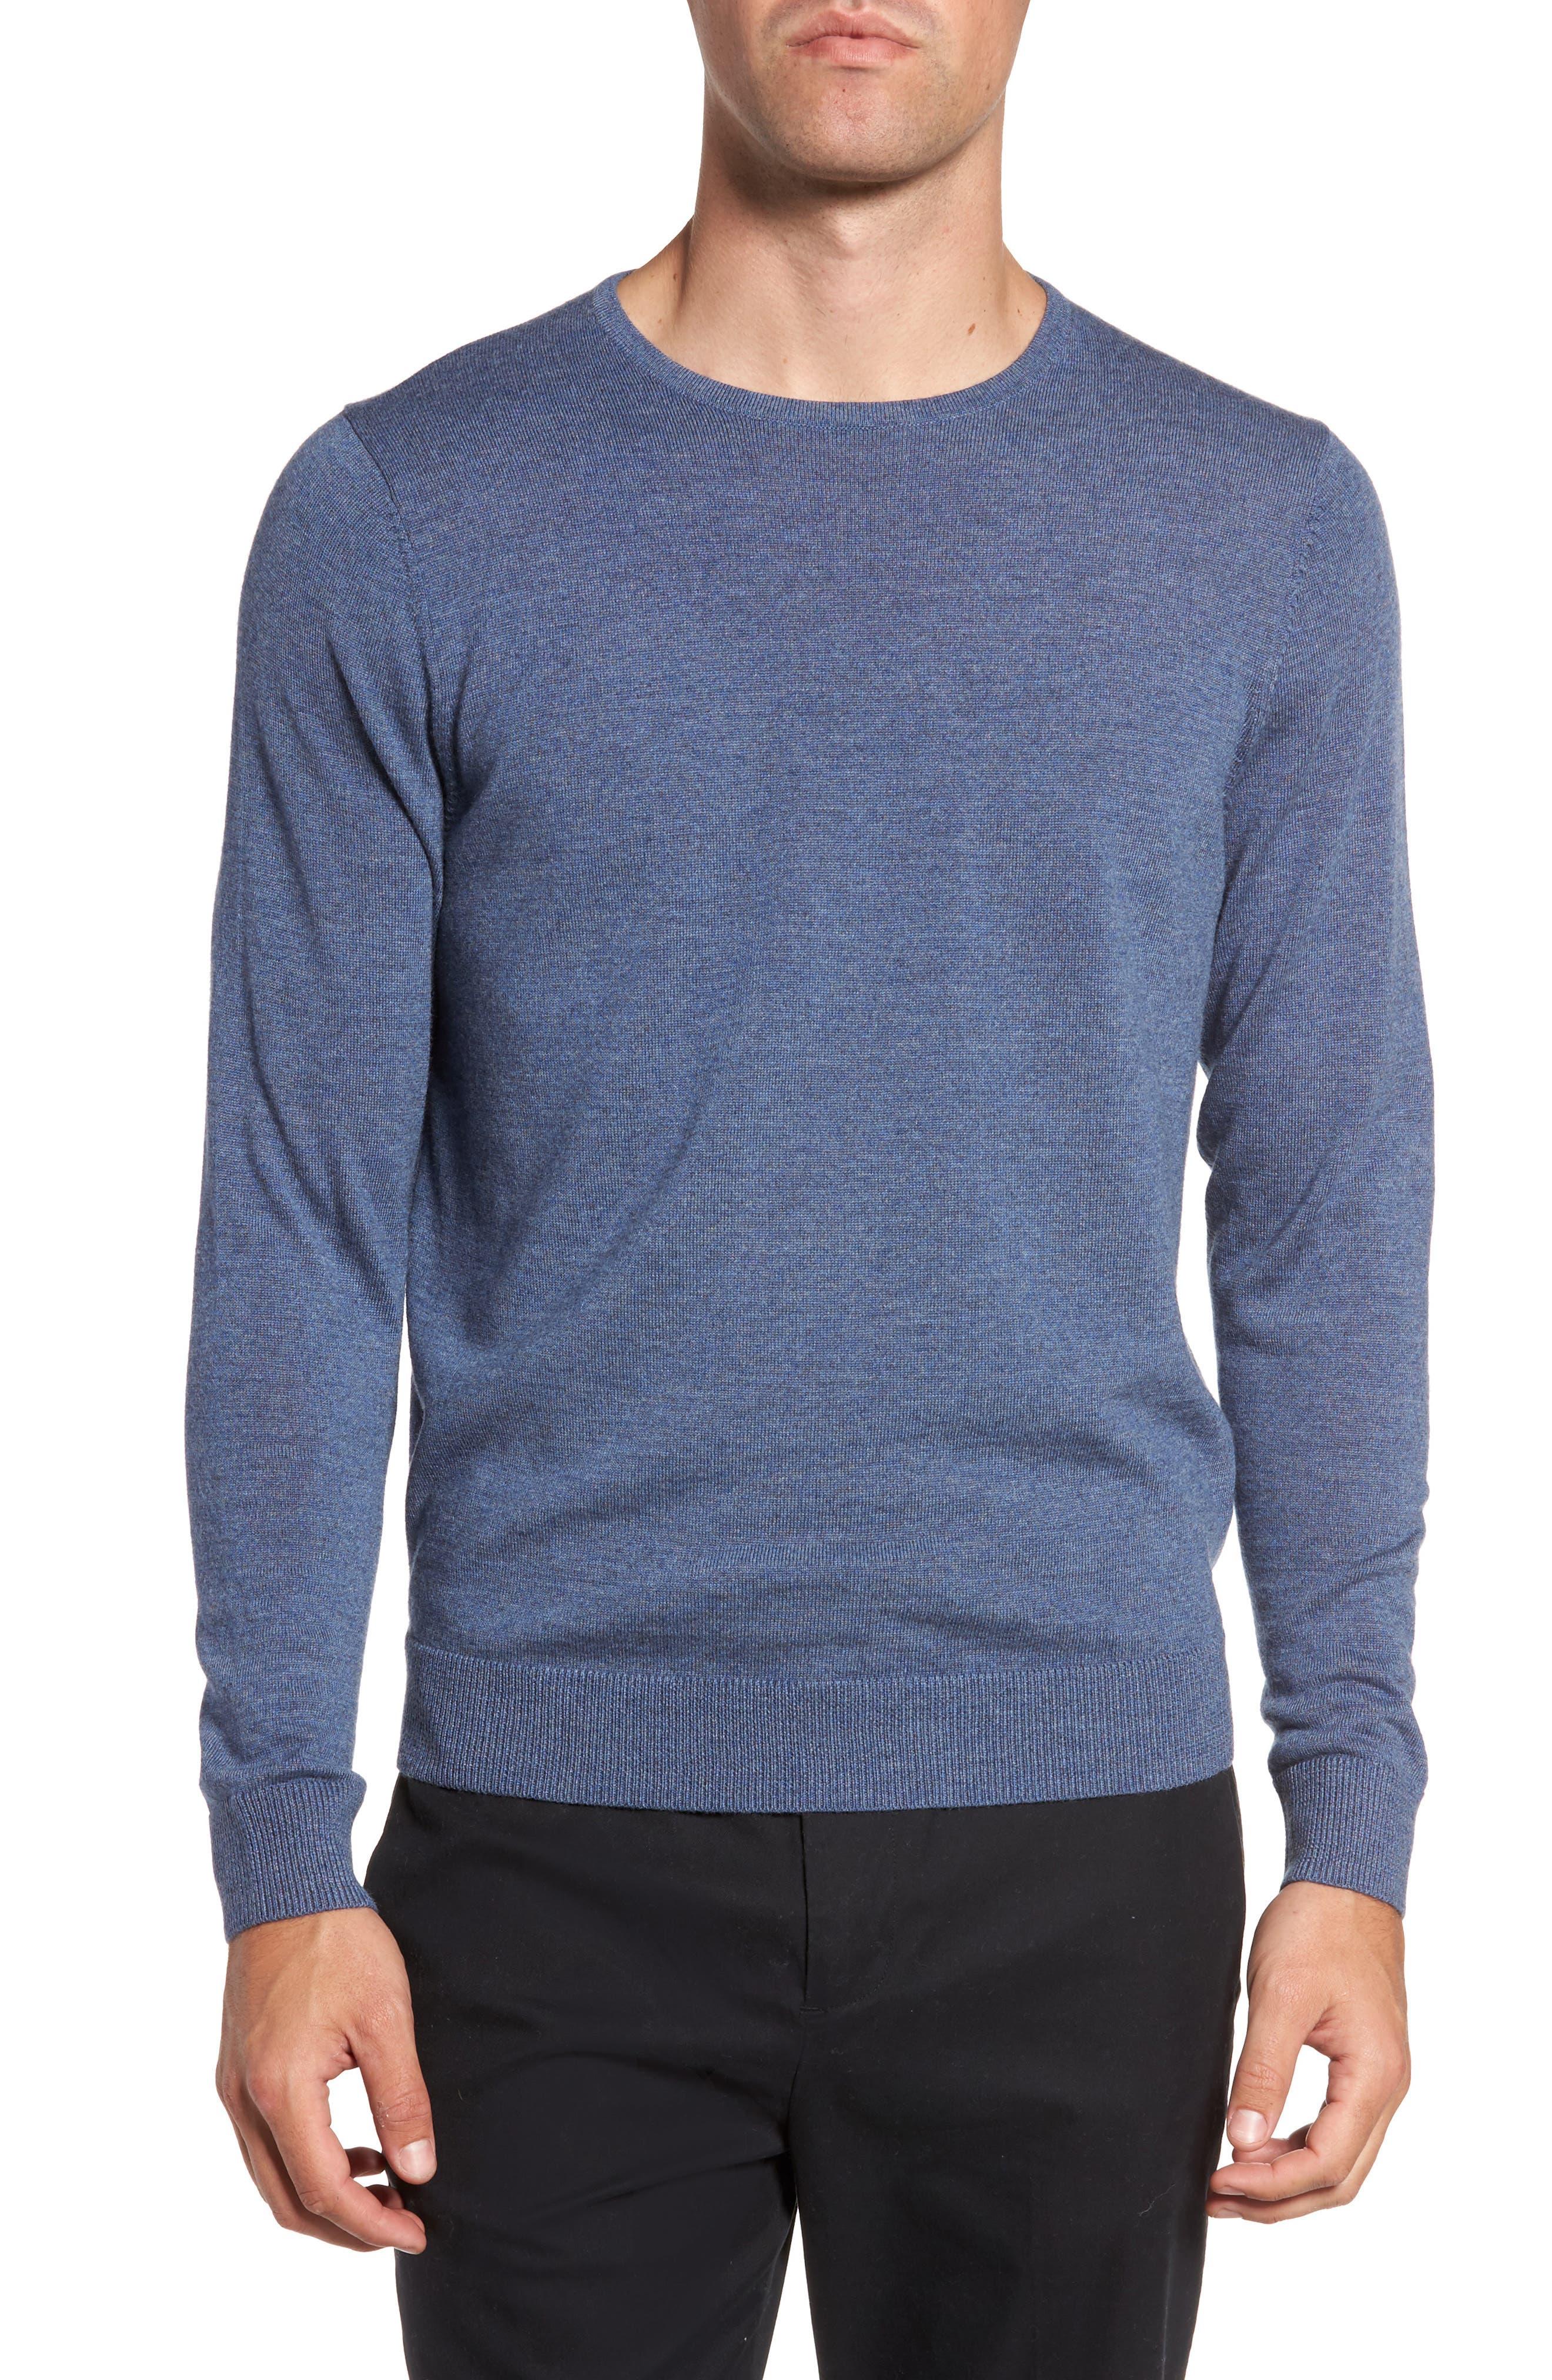 Nordstrom Shop Crewneck Merino Wool Sweater, Blue